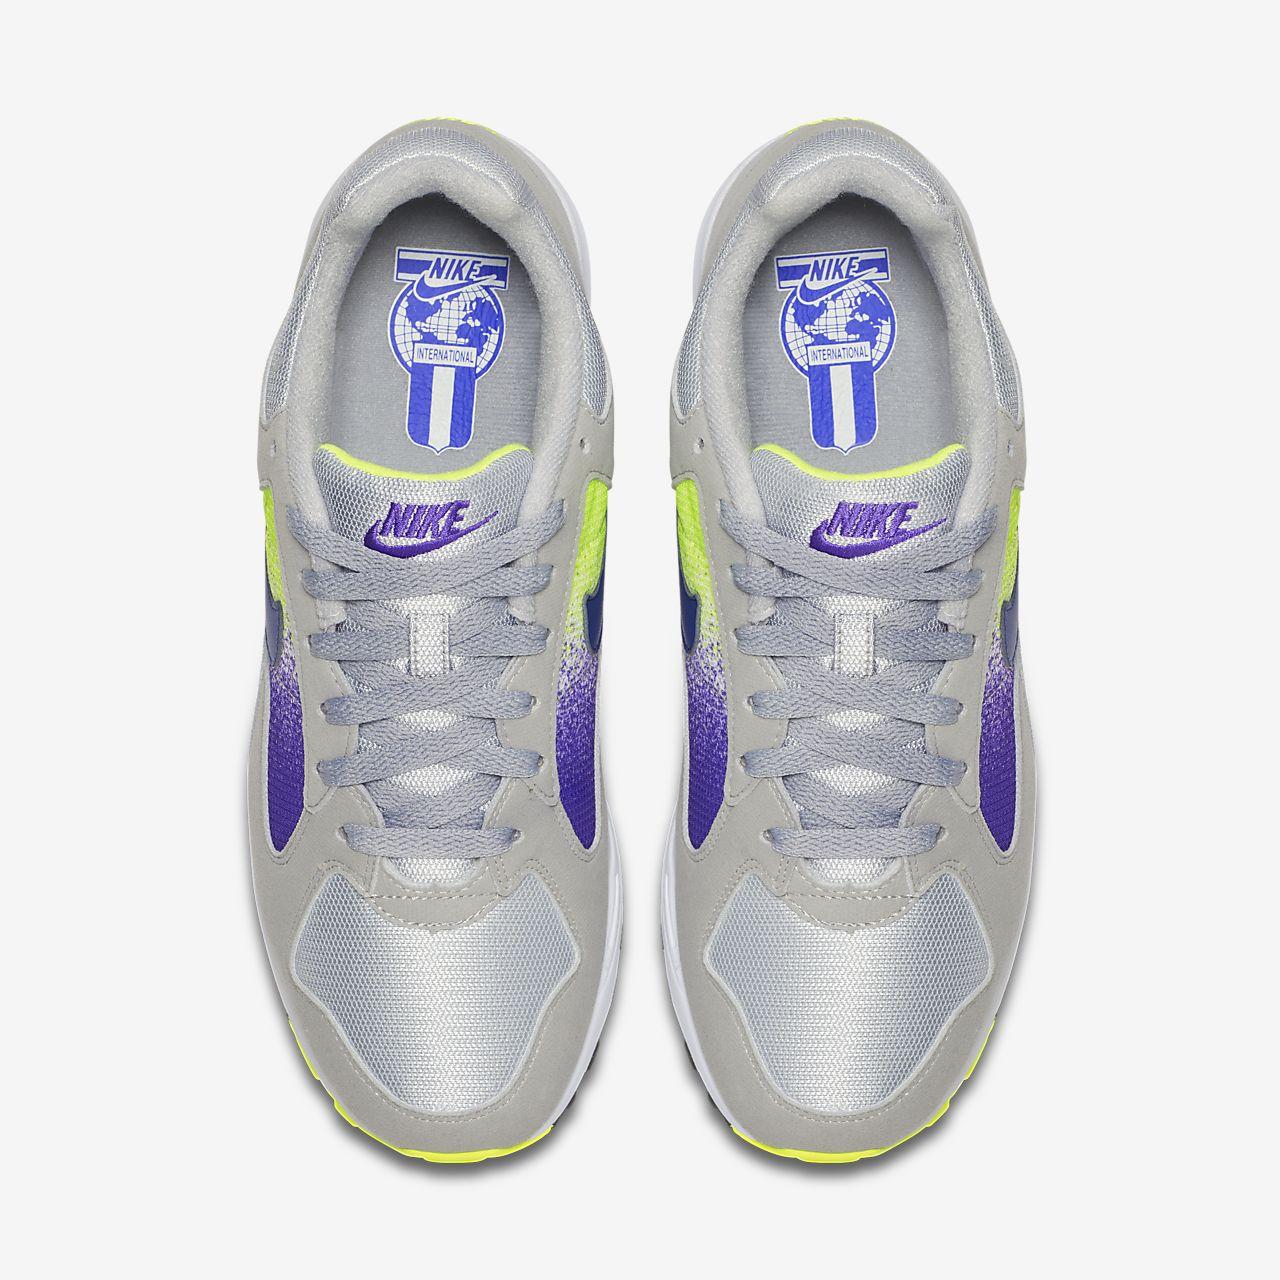 a72b27f82fb Nike Air Skylon II Men's Shoe. Nike.com CA